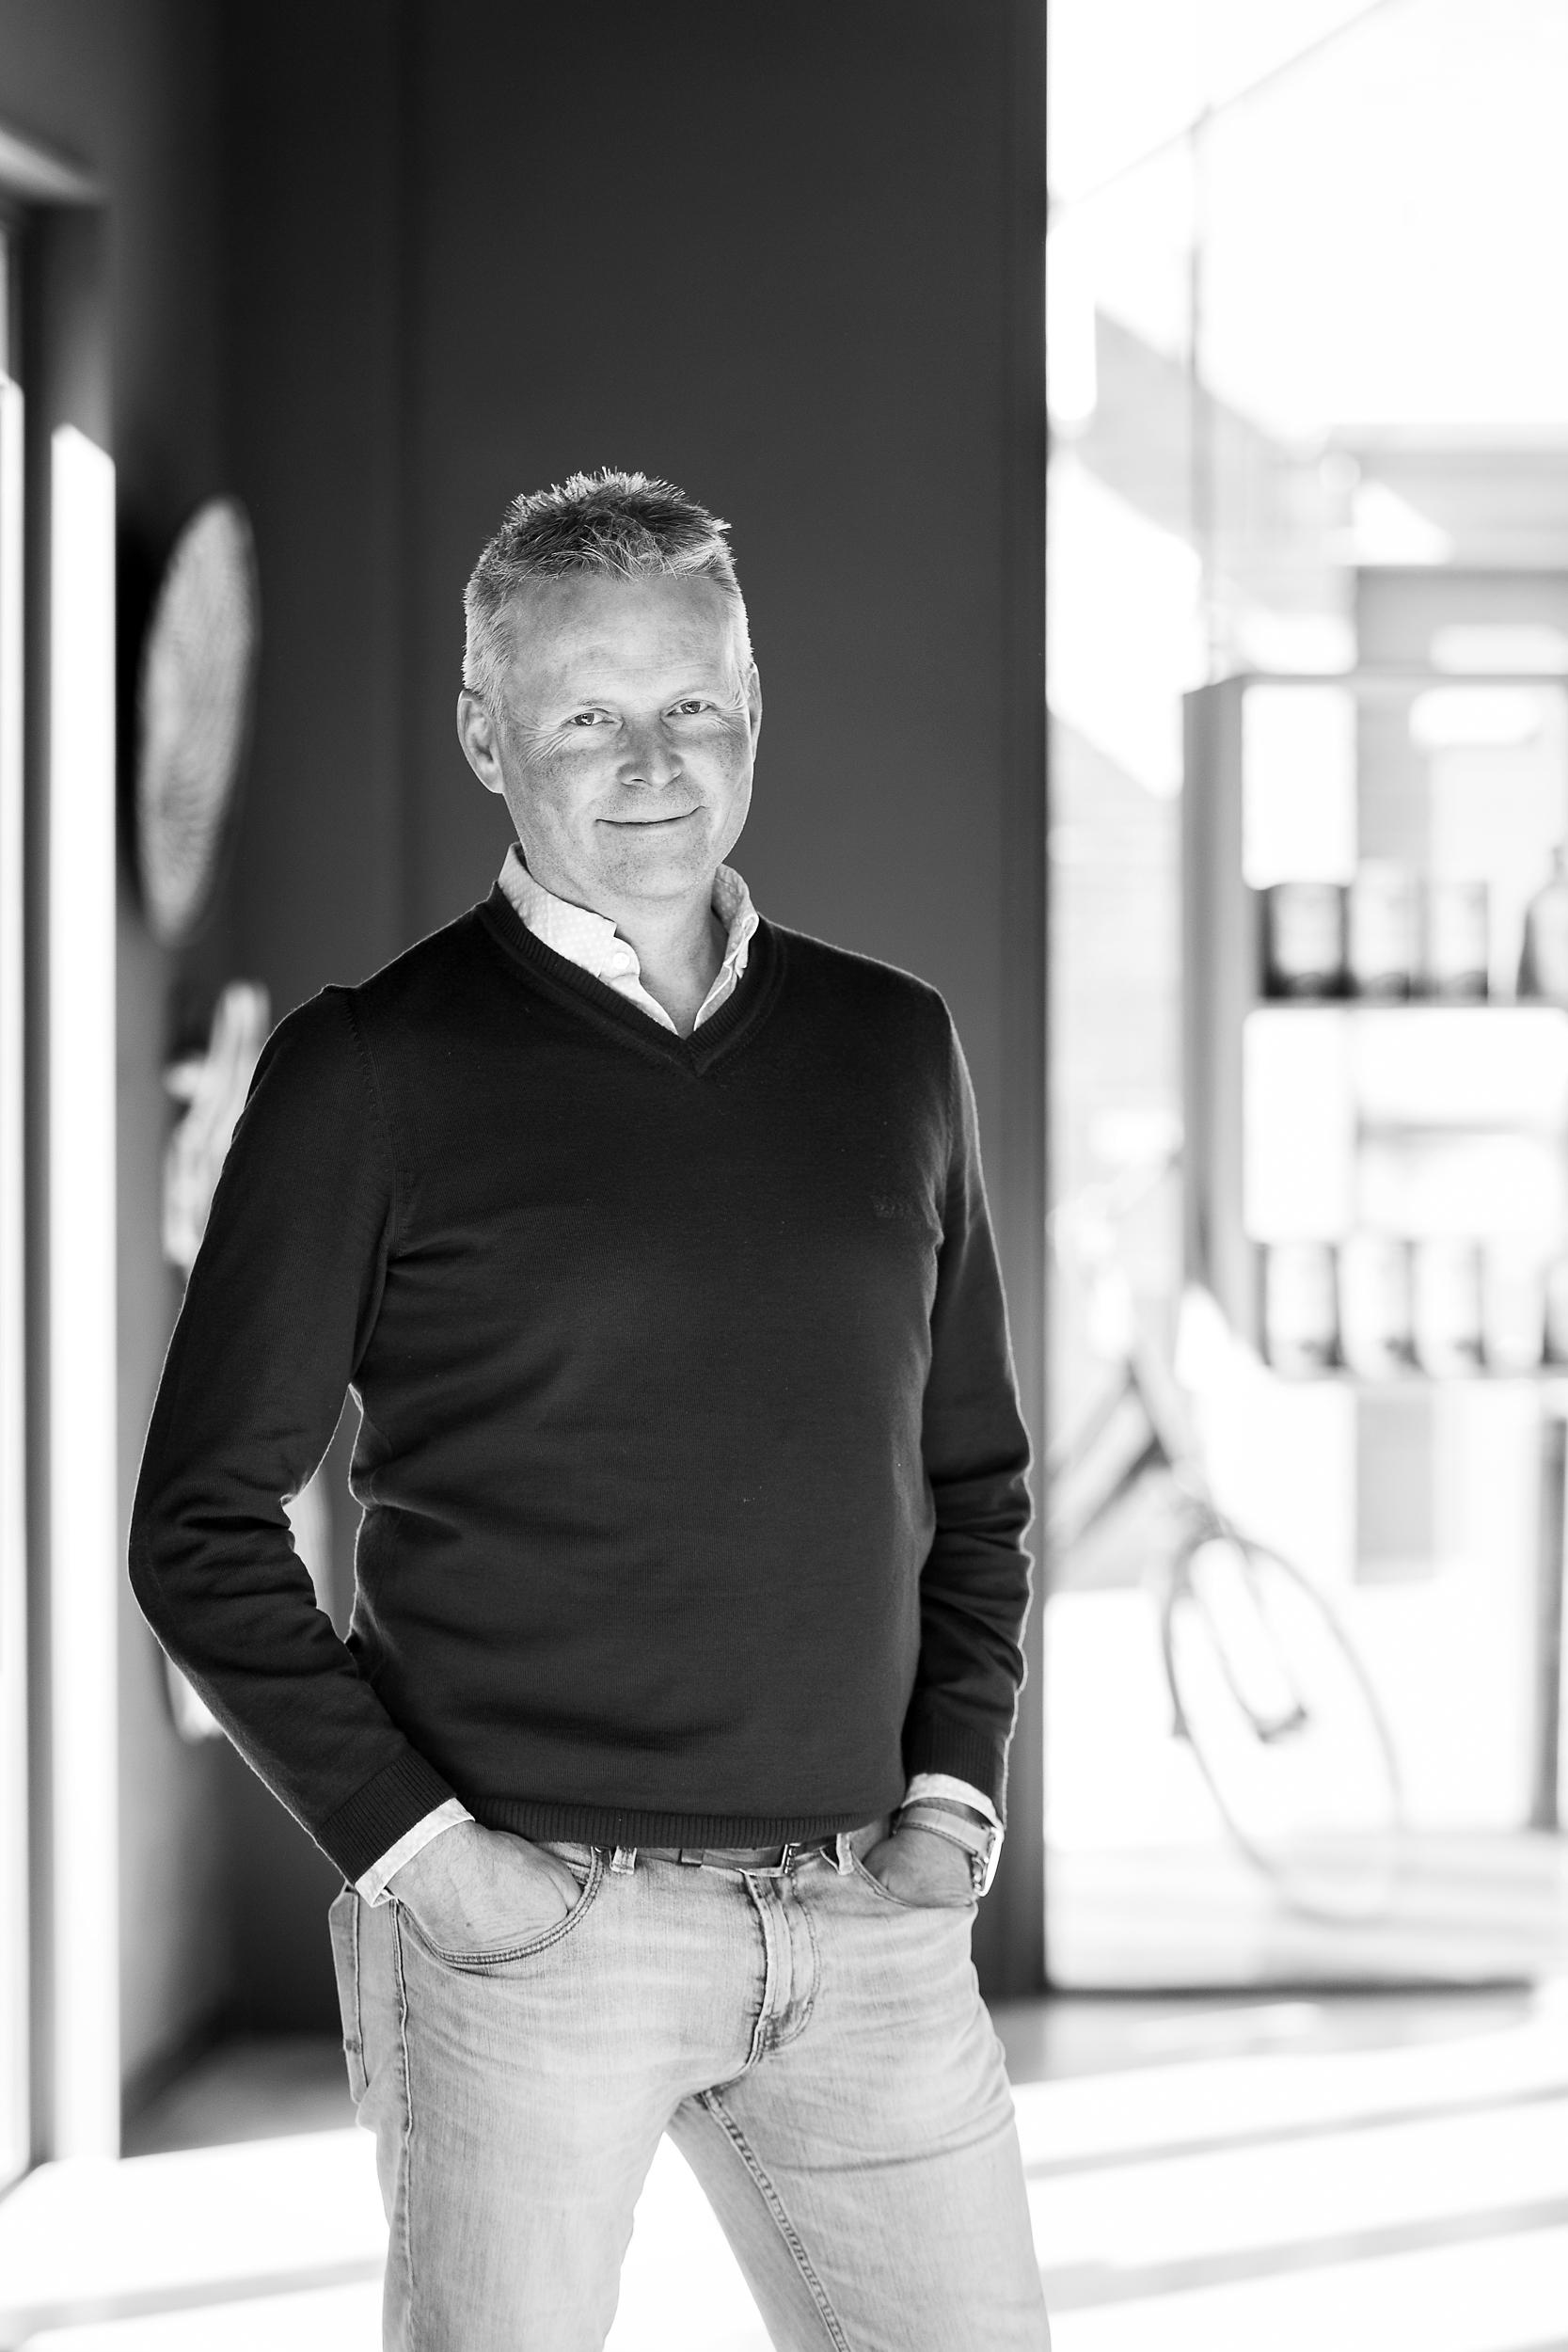 Johan Visser